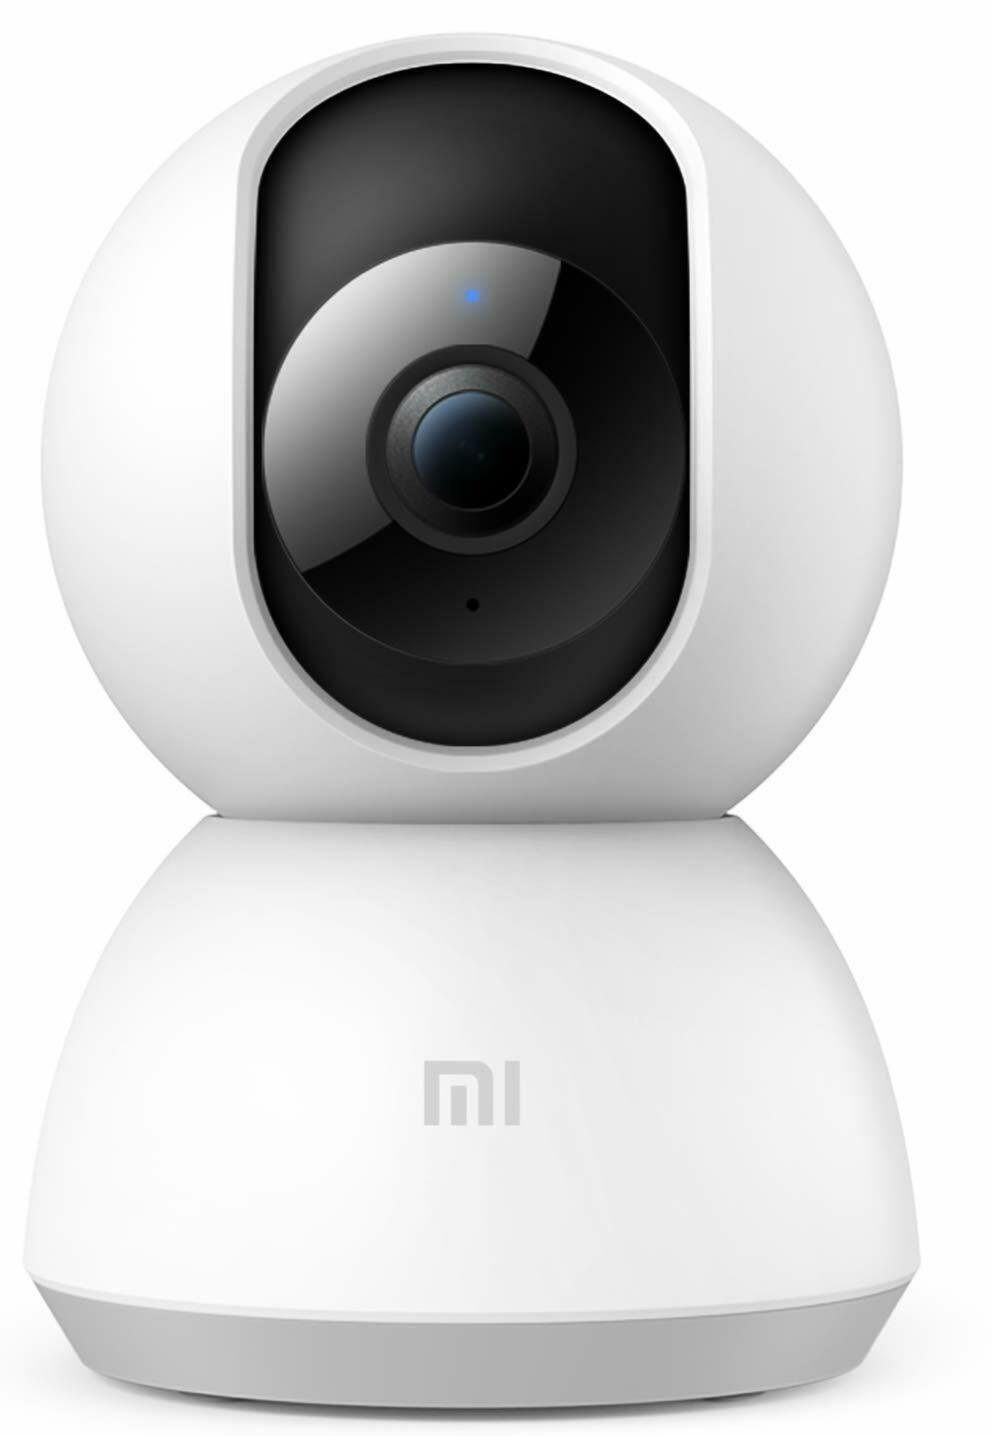 Mi Home Security Camera 360° 1080P (Open Box)